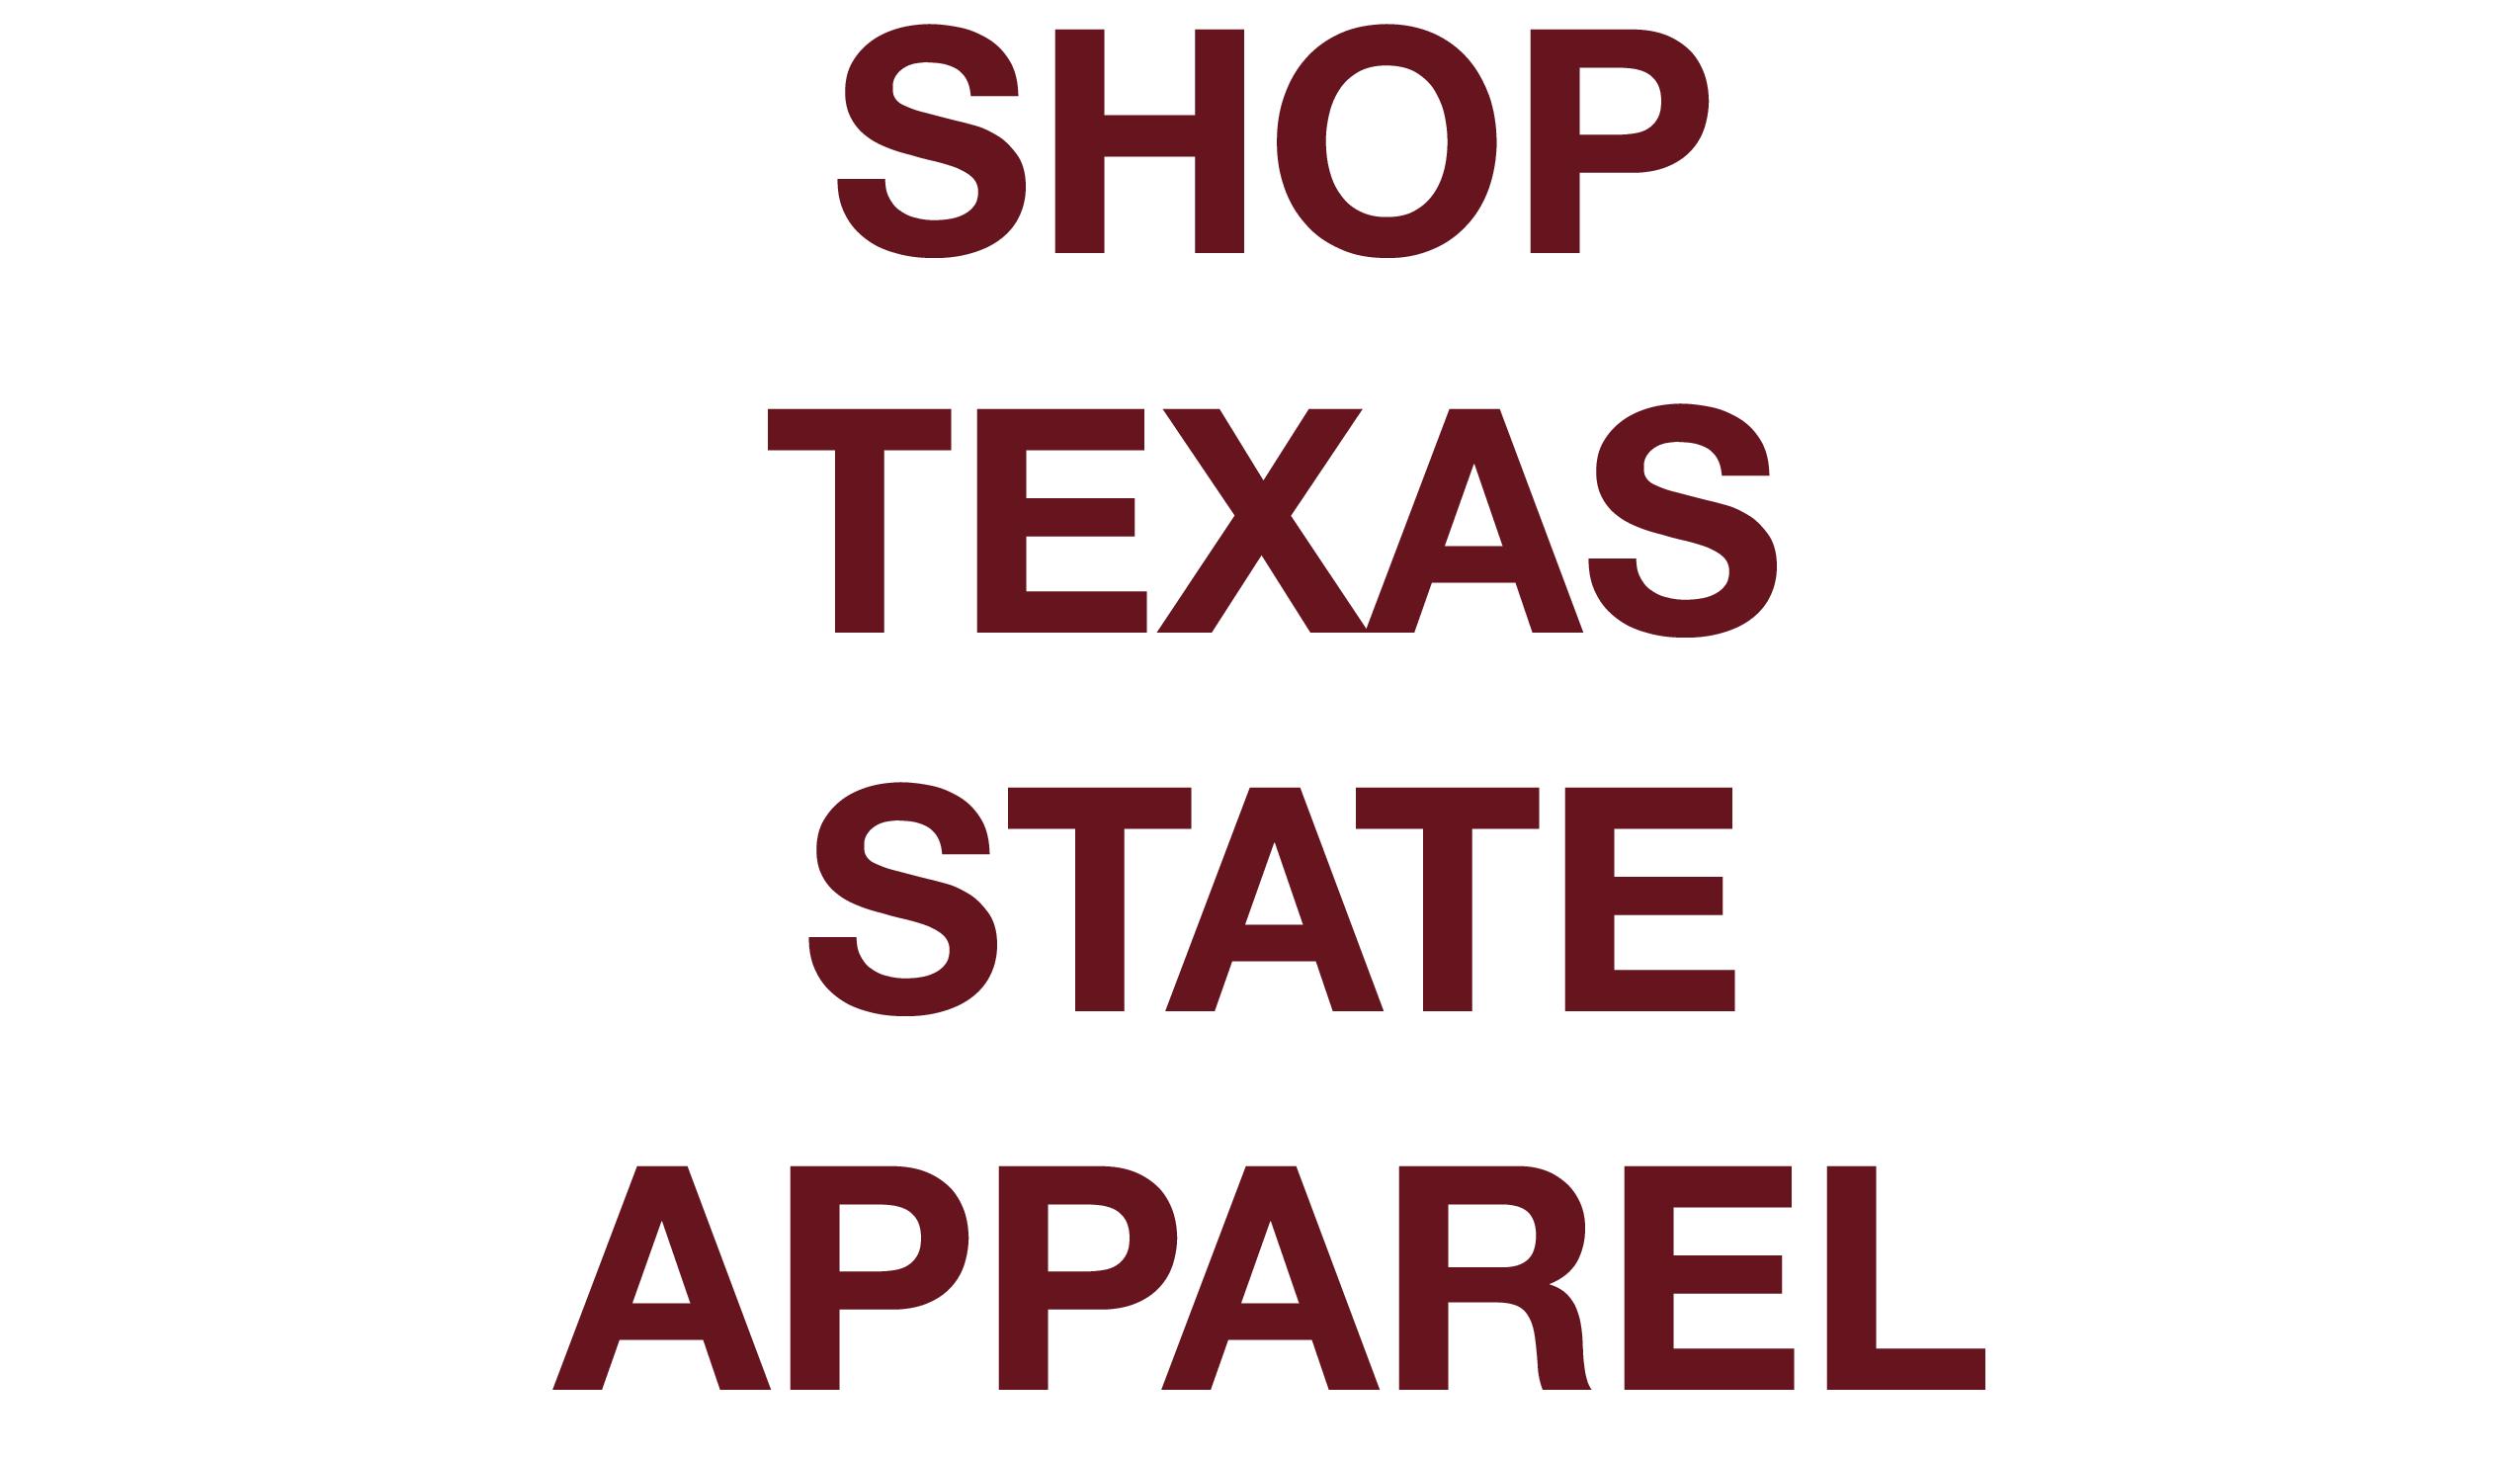 Shop Custom Apparel, Shop Texas State Apparel, Texas State University Apparel, TXST Apparel